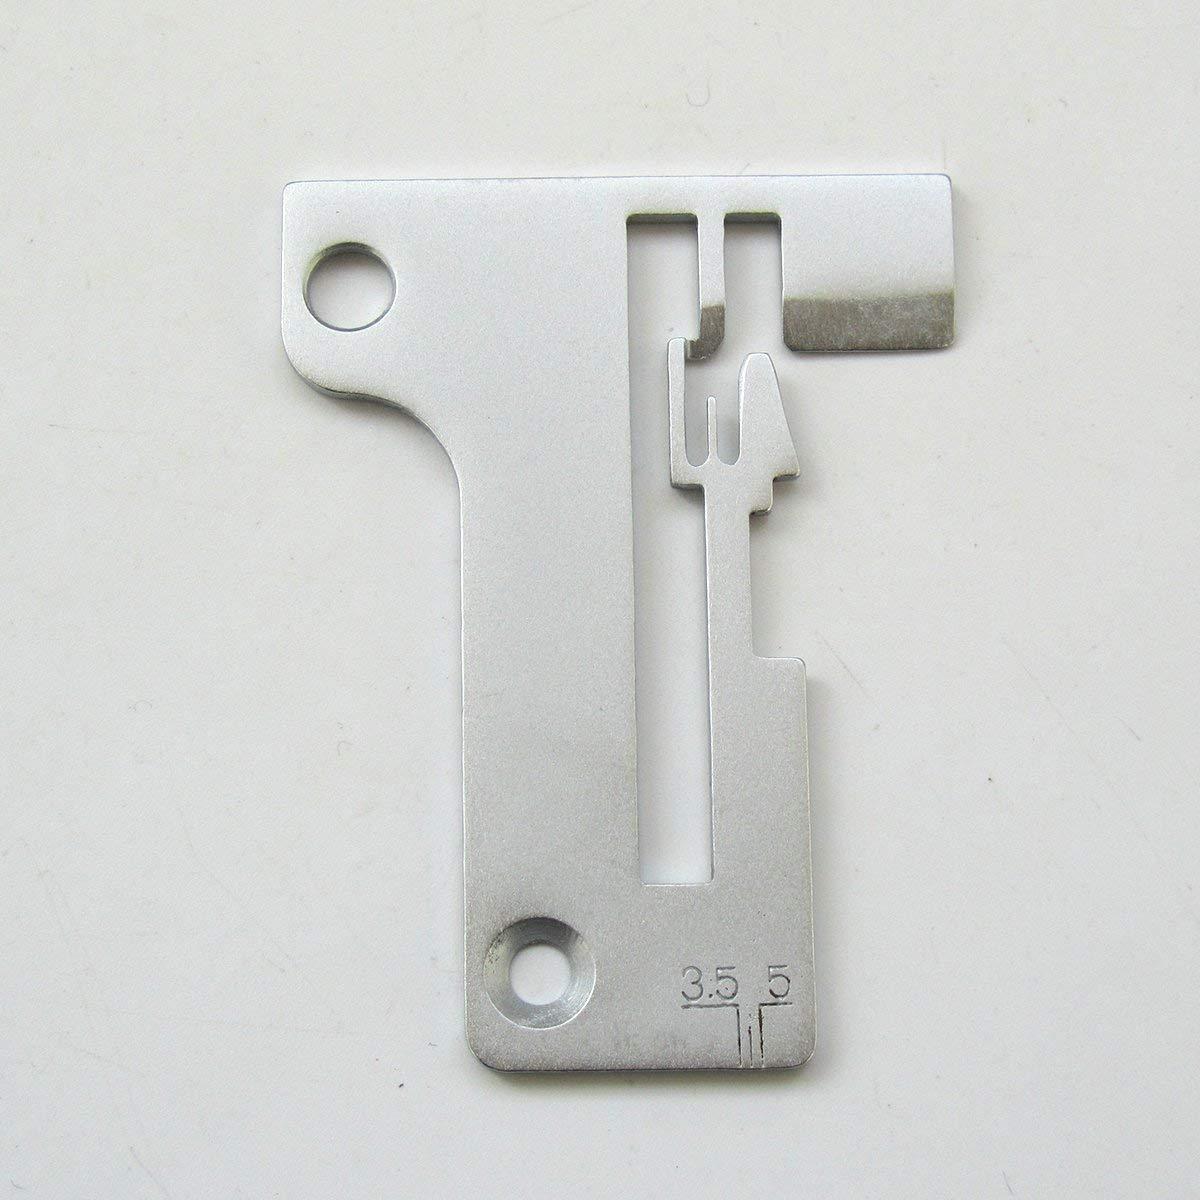 Sewing YICBOR Upper Looper 550568 for Singer Serger 14CG744